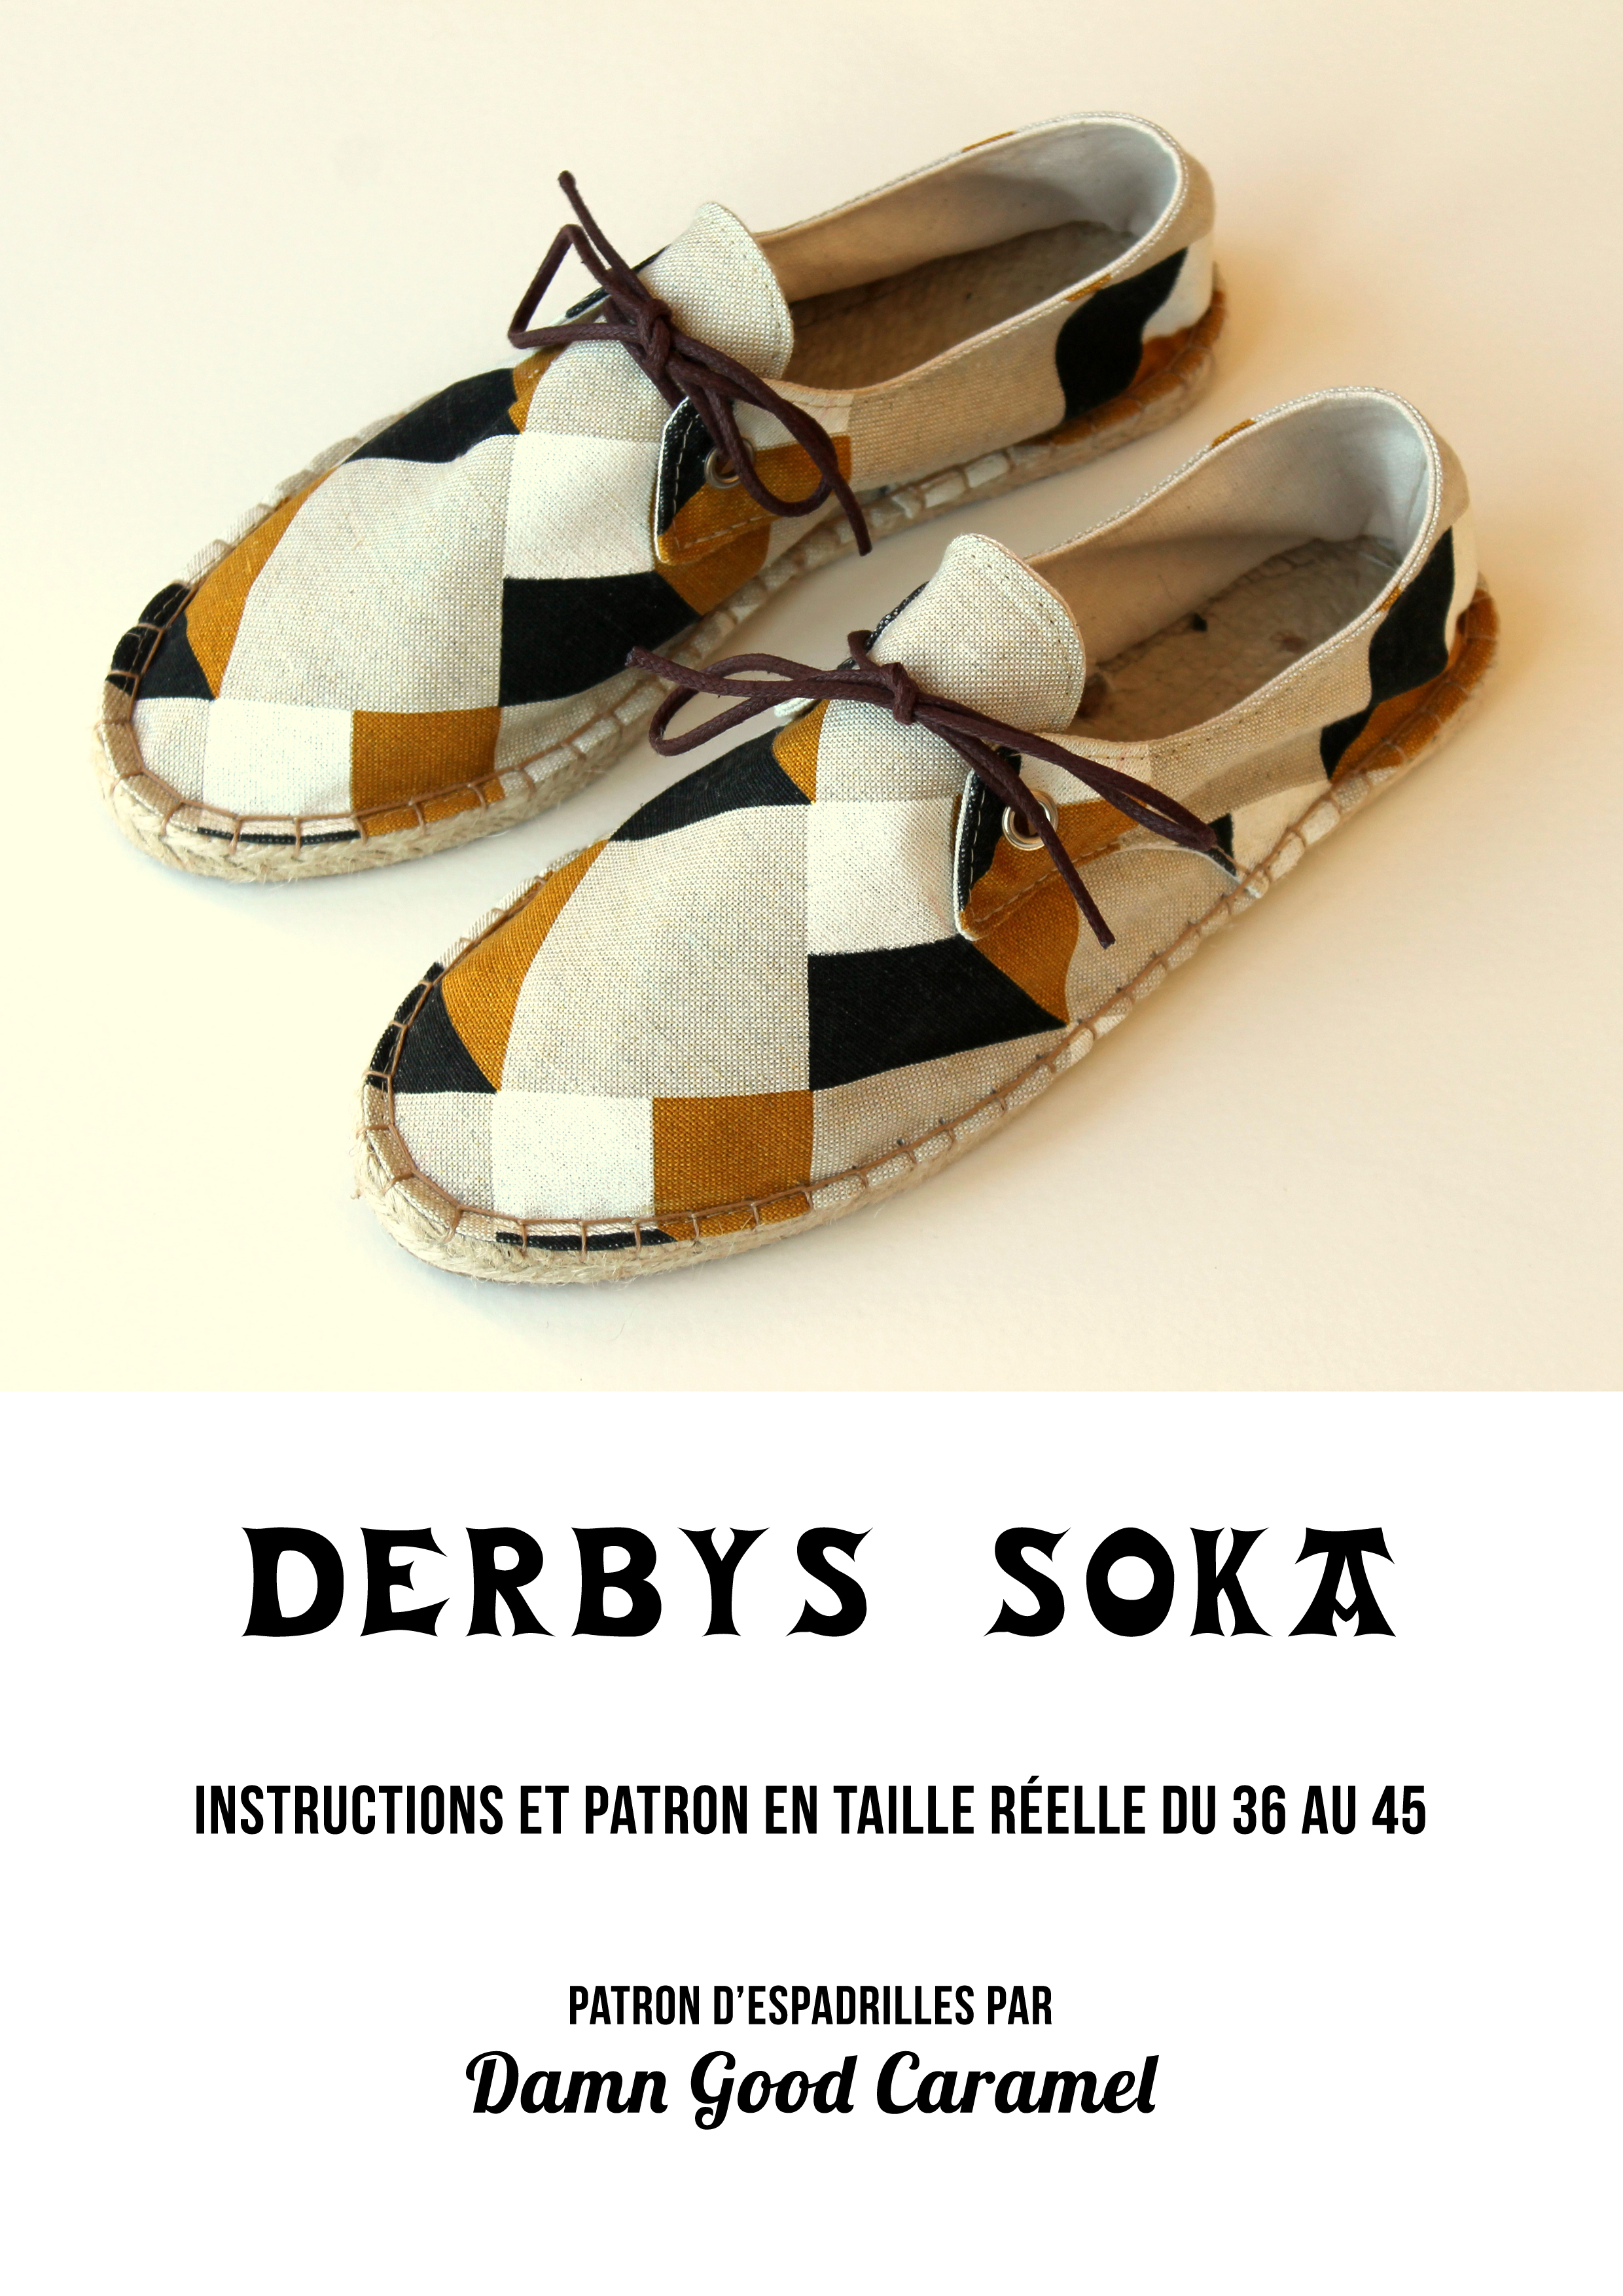 Acheter le patron des DERBYS SOKA